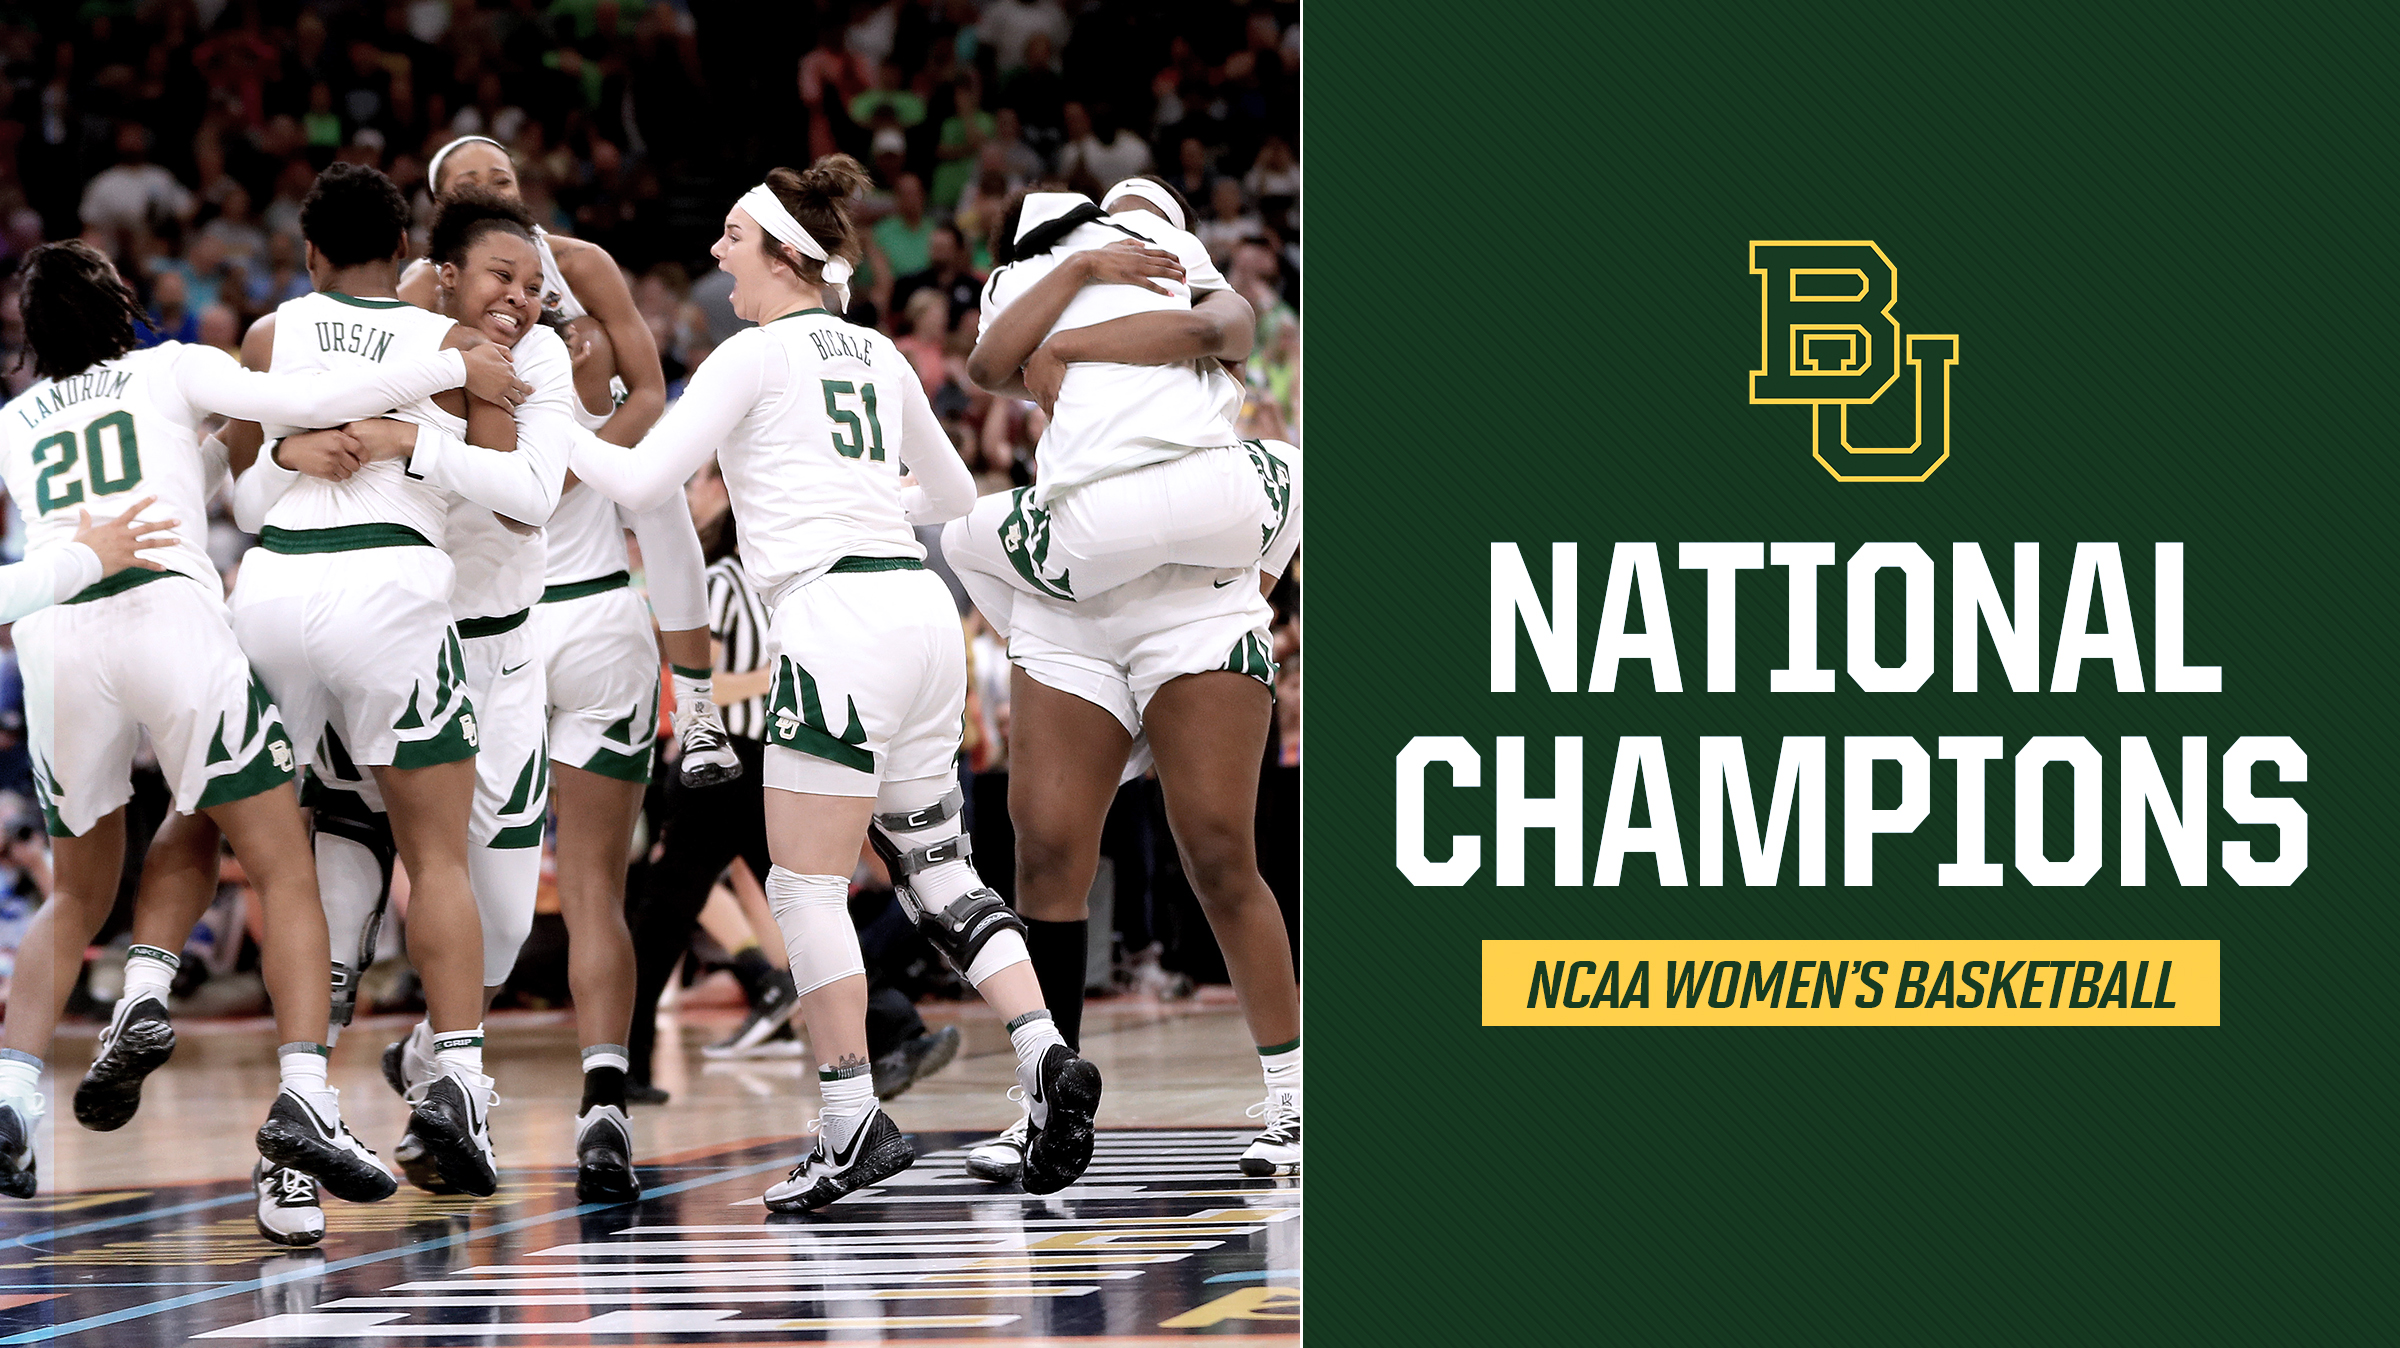 Baylor beats Notre Dame for national championship: Kim Mulkey, Lauren Cox, Chloe Jackson celebrate